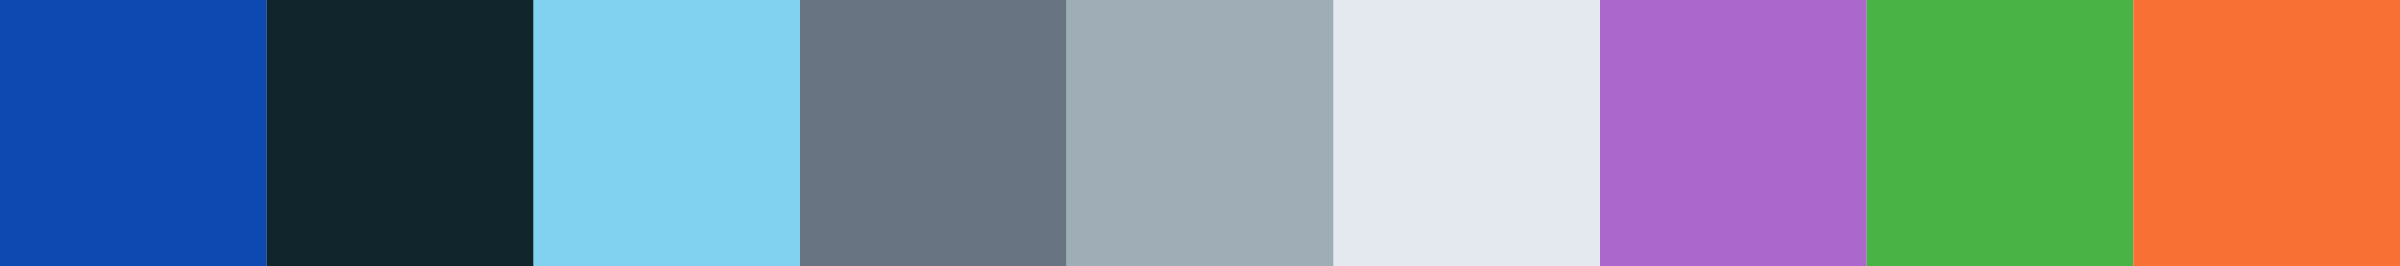 YC-palette